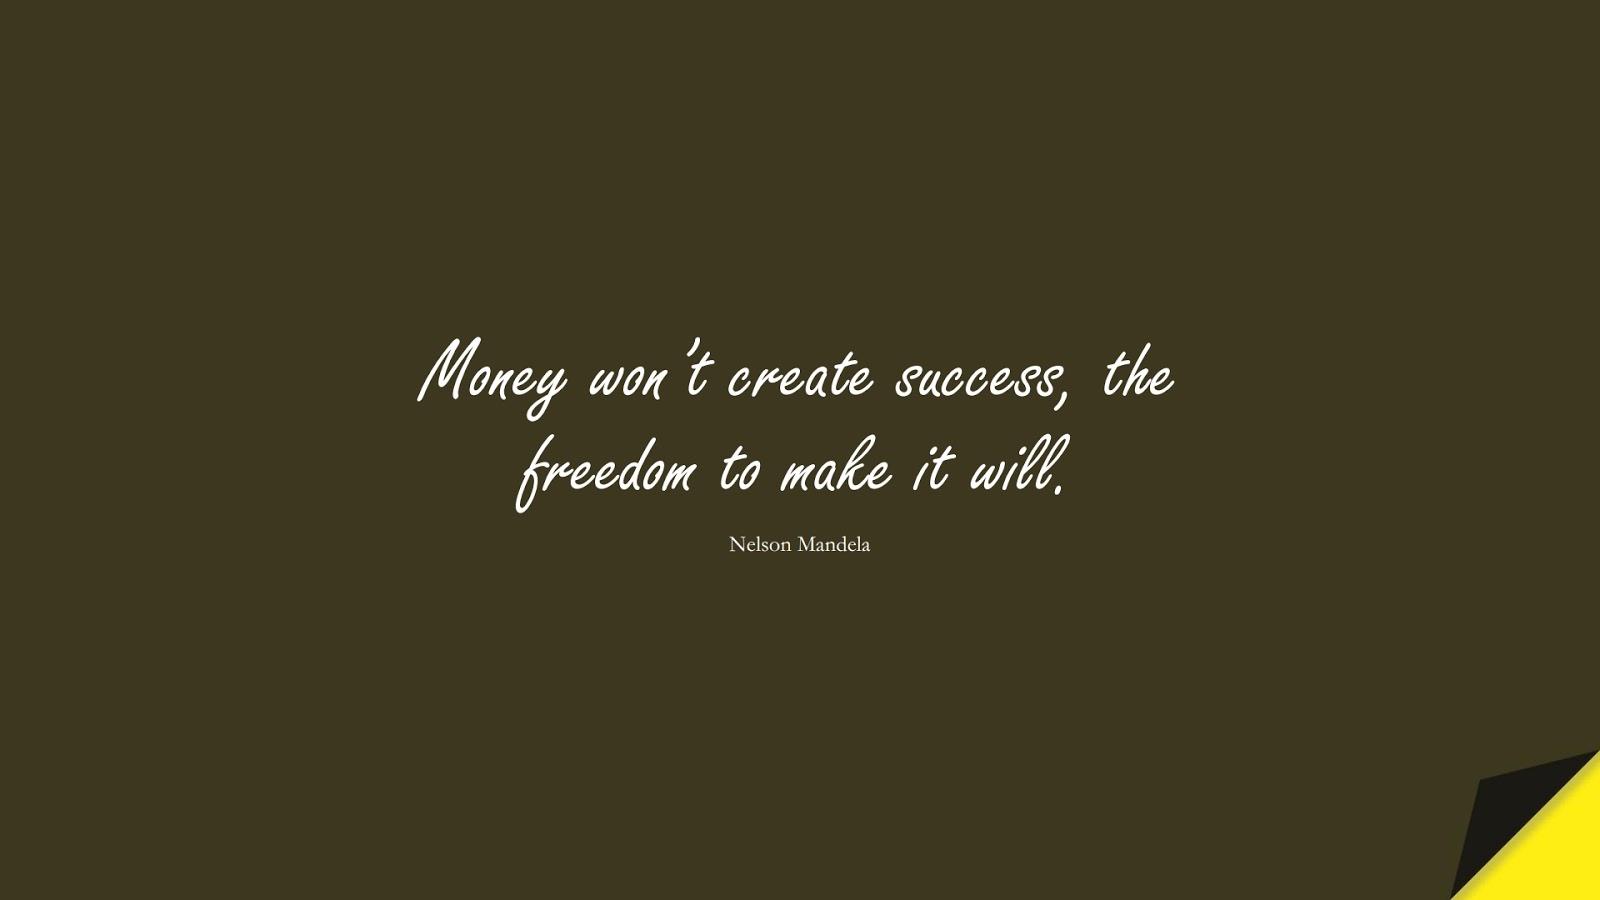 Money won't create success, the freedom to make it will. (Nelson Mandela);  #SuccessQuotes